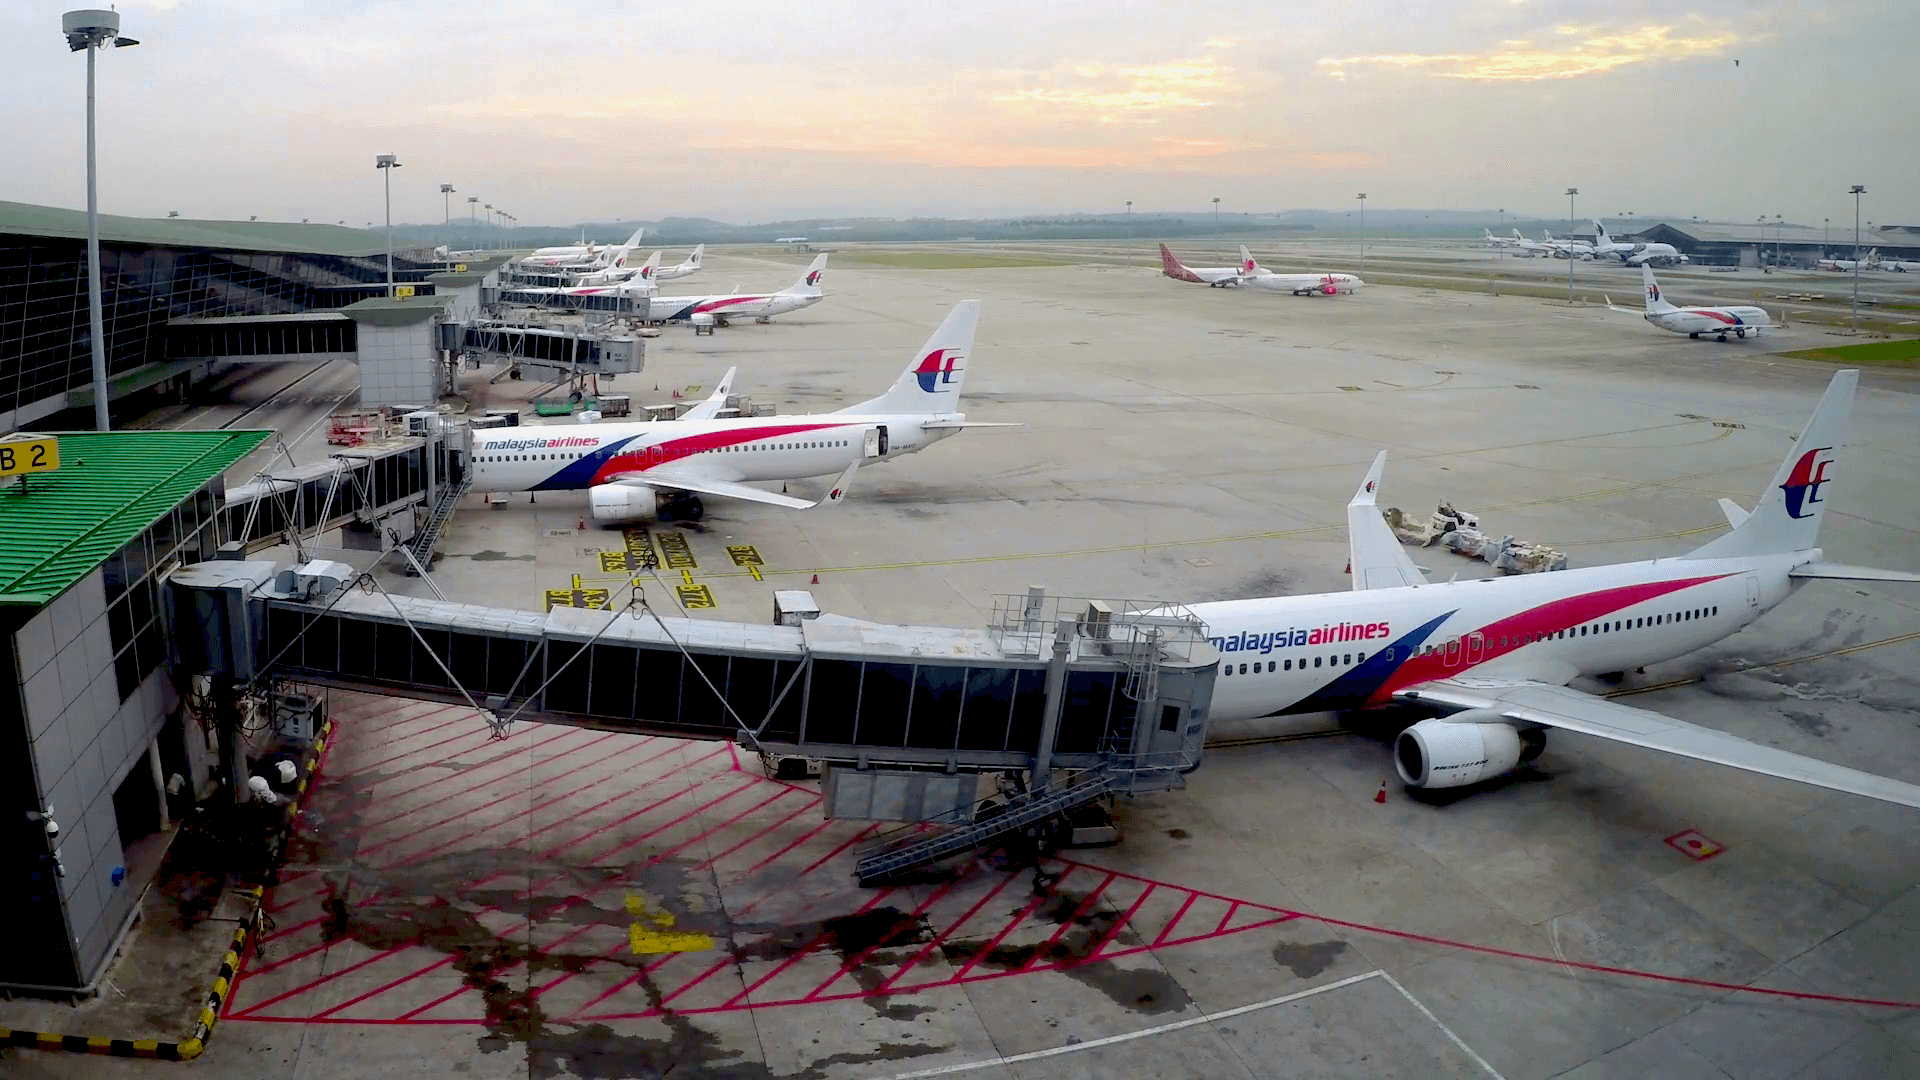 Kuala Lumpur International Airport Malaysia Airlines Flotte